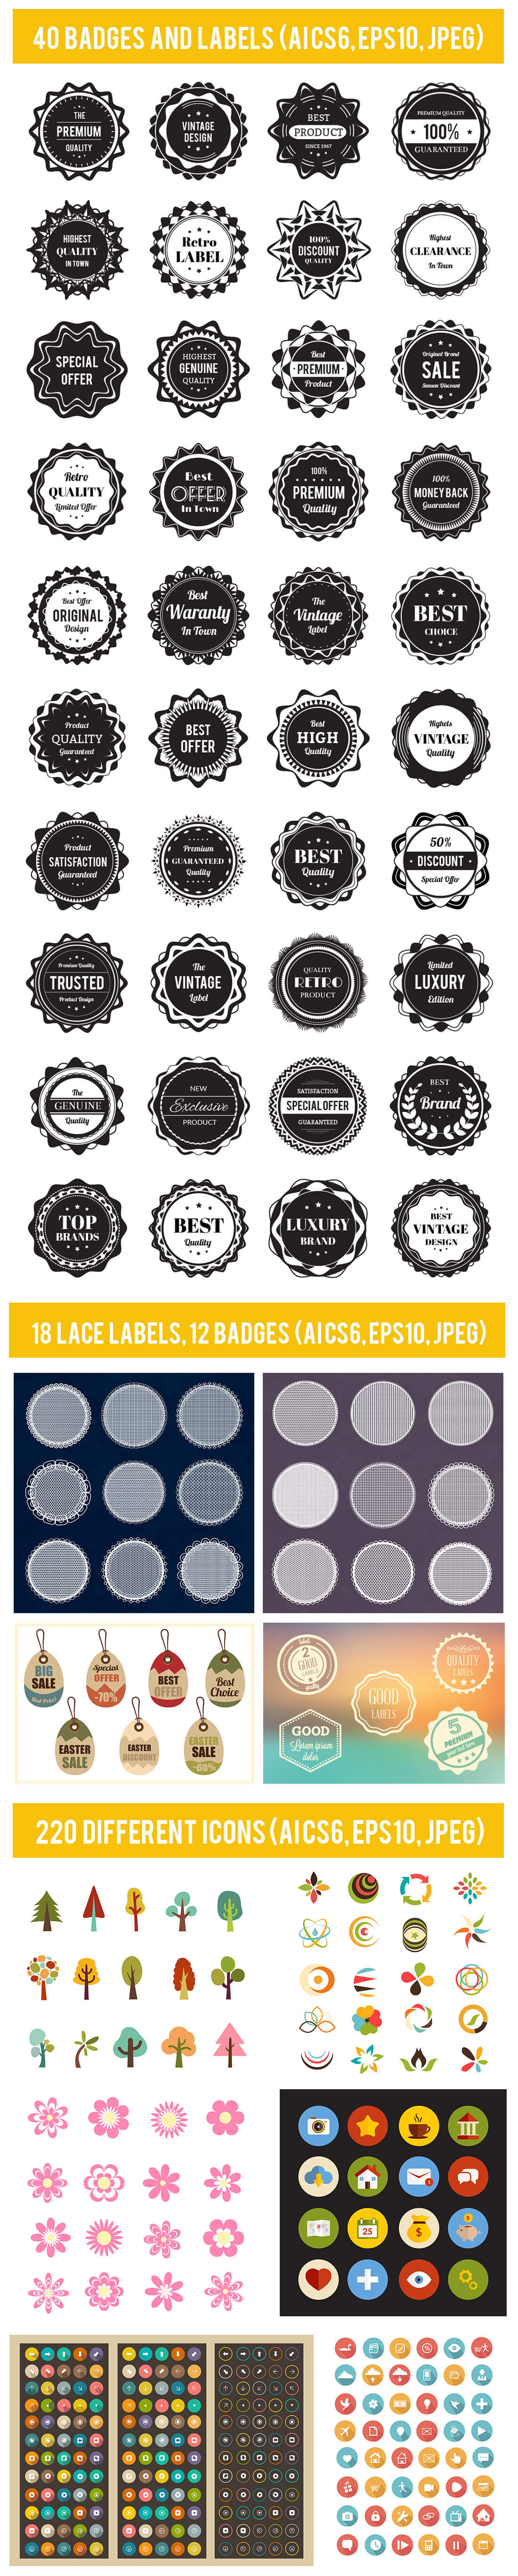 1000 graphic elements pdf